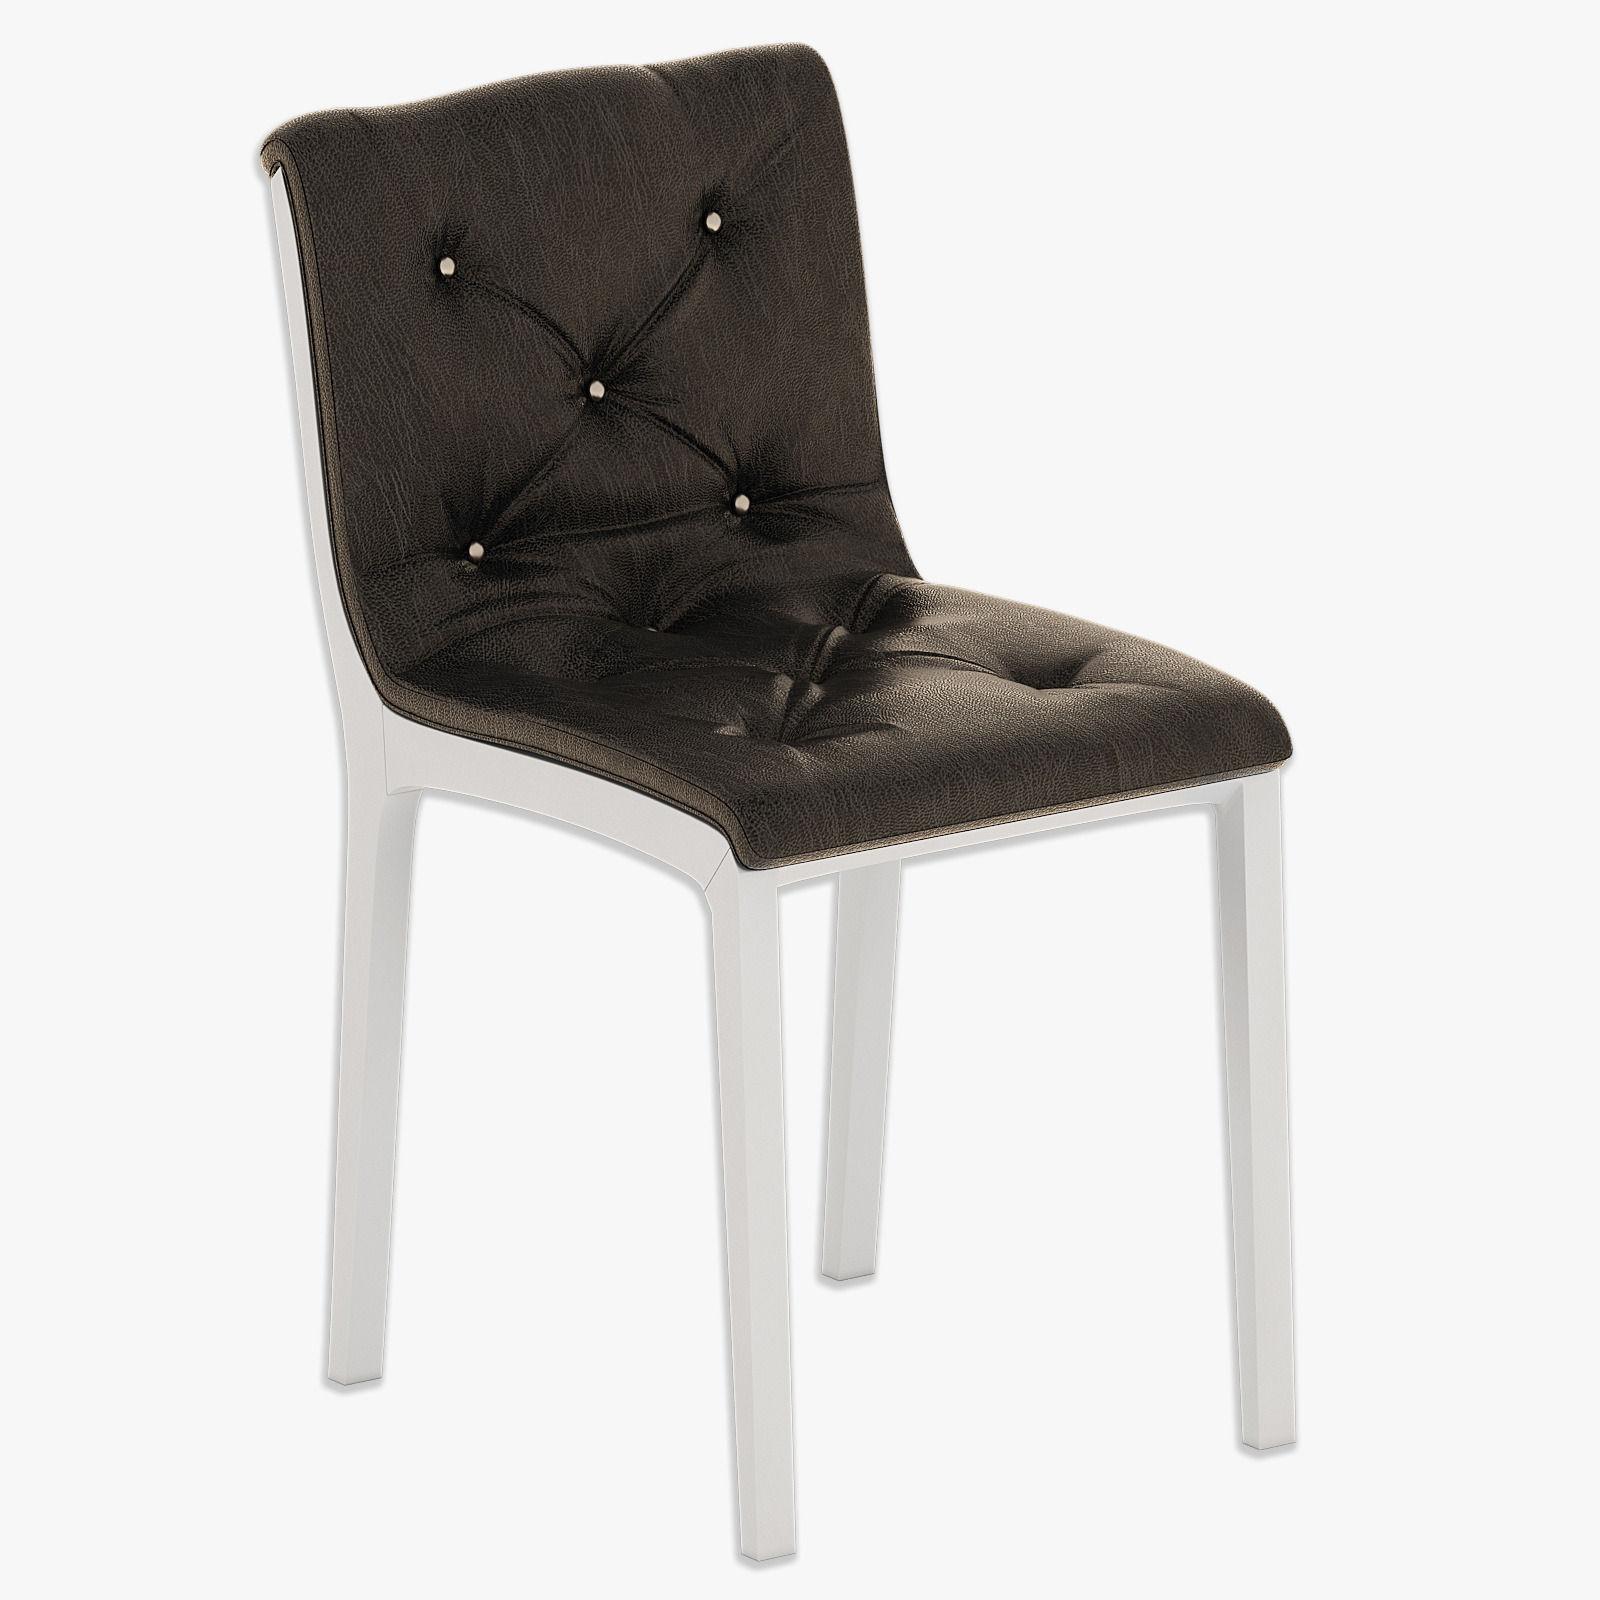 MIDJ Shine Chair